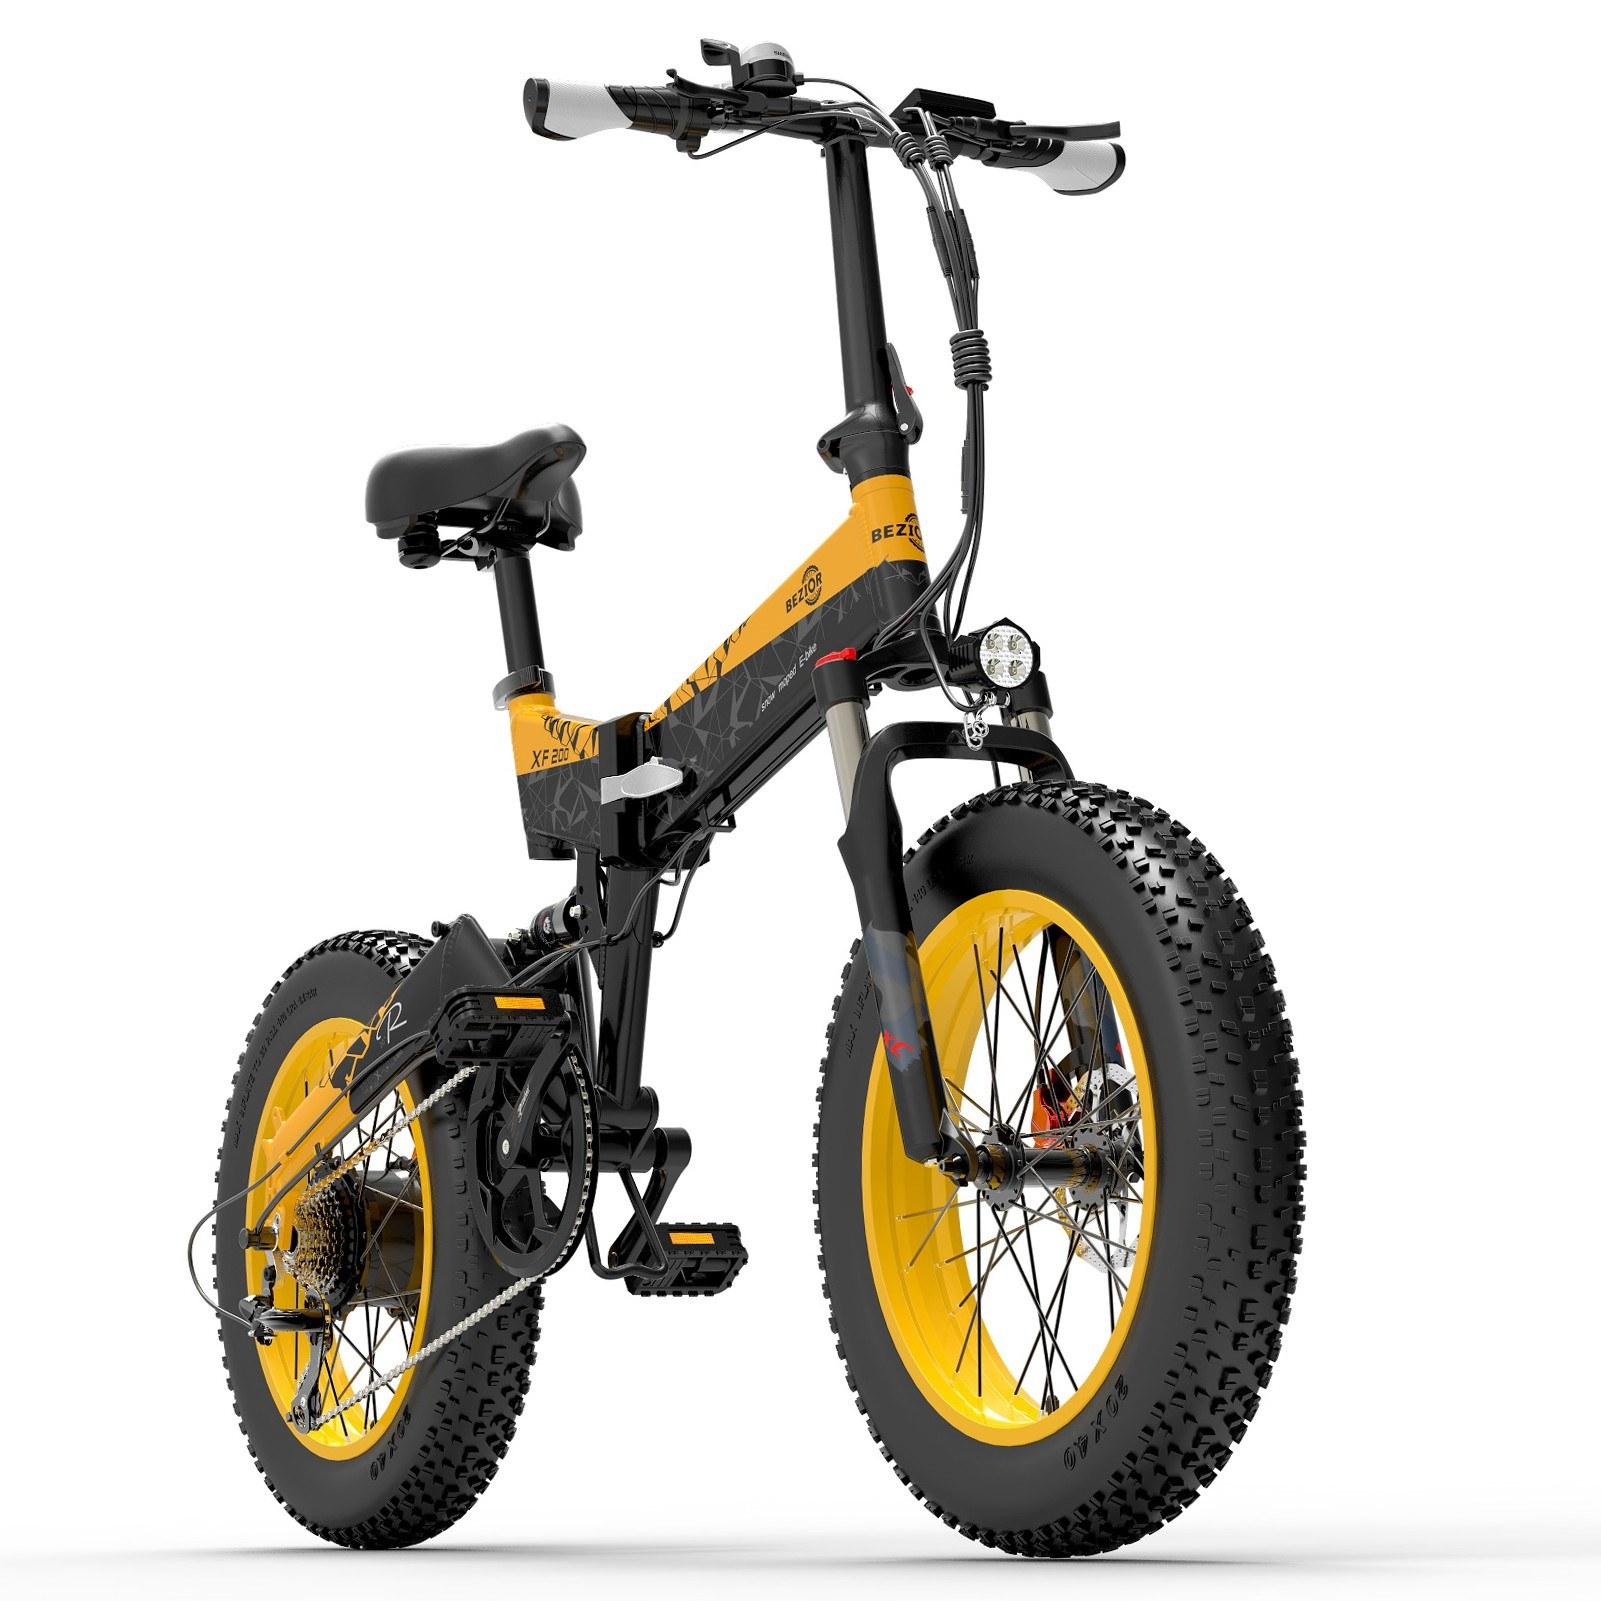 tomtop.com - [EU Warehouse] $485 OFF BEZIOR XF200 1000W Motor Folding Electric Moped Bike, $1480 (Inclusive of VAT)